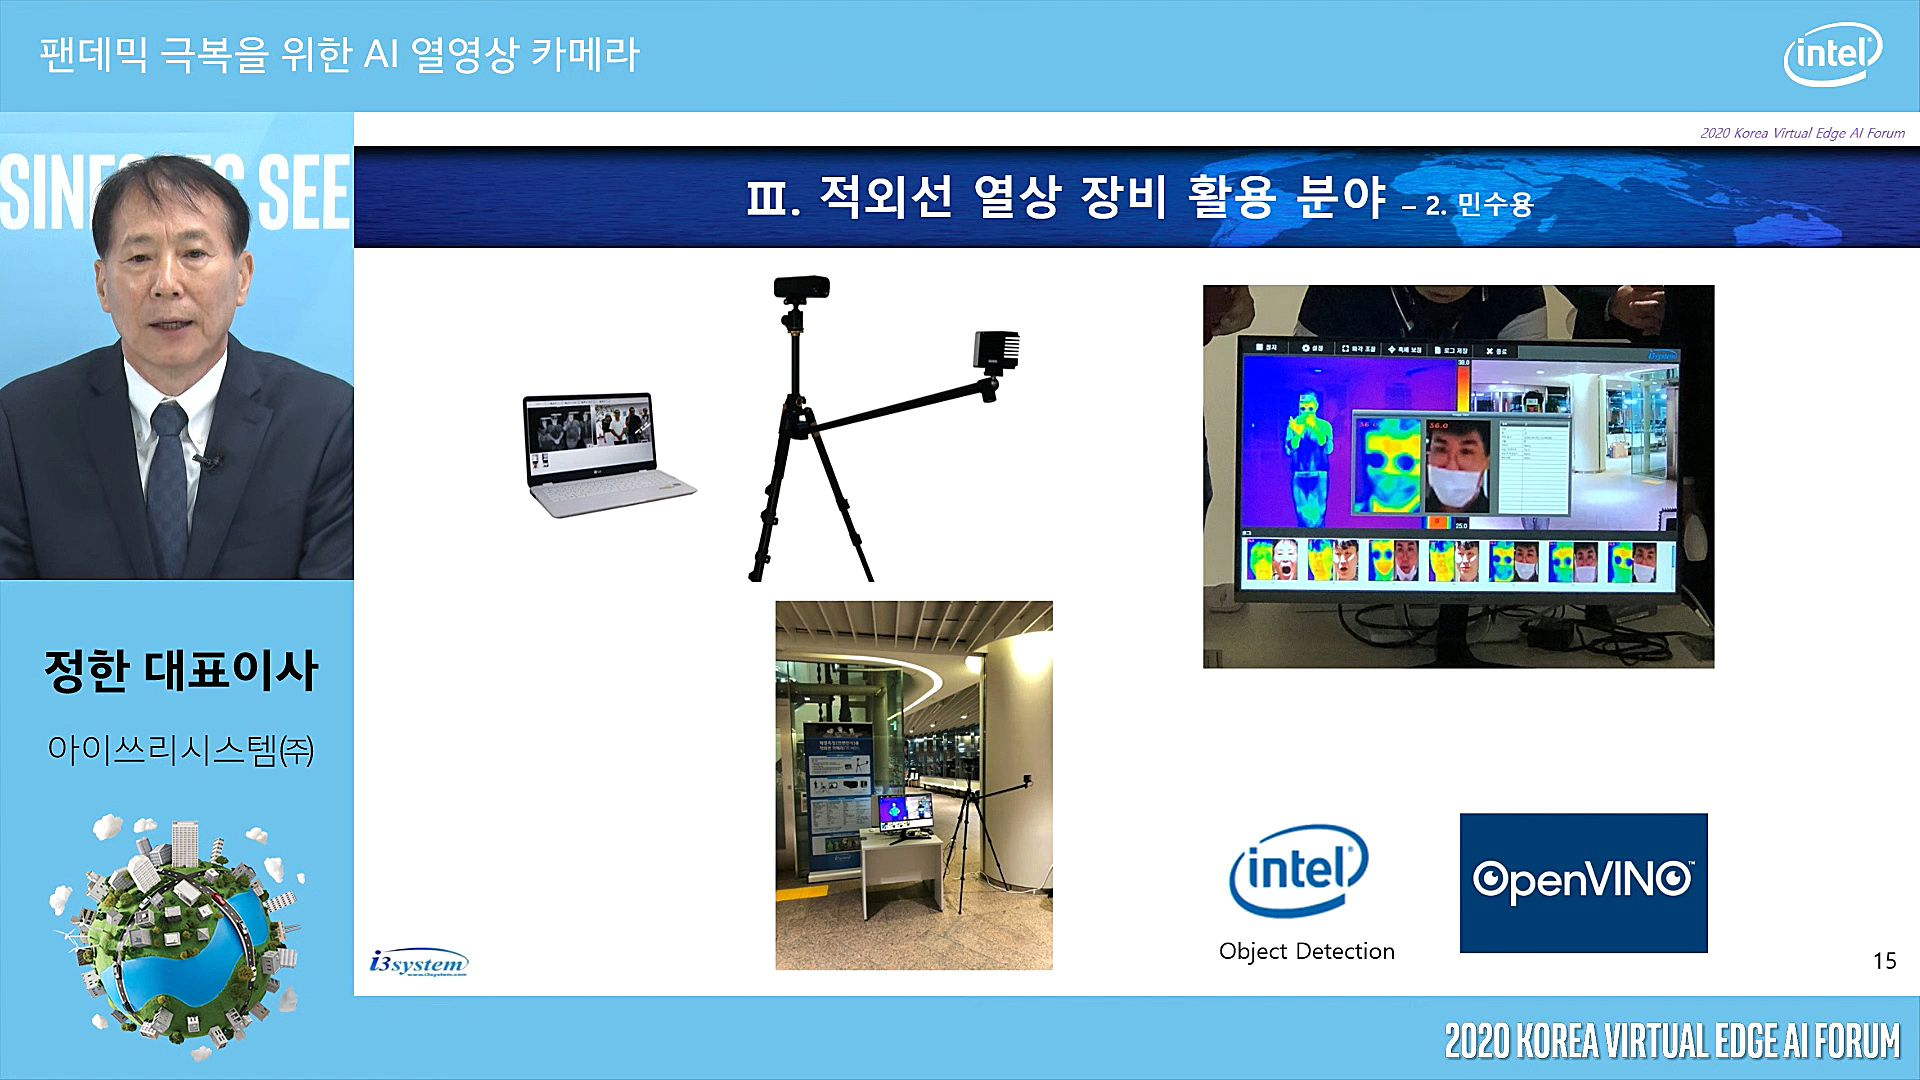 200729_Korea Edge AI Forum_Contents_4